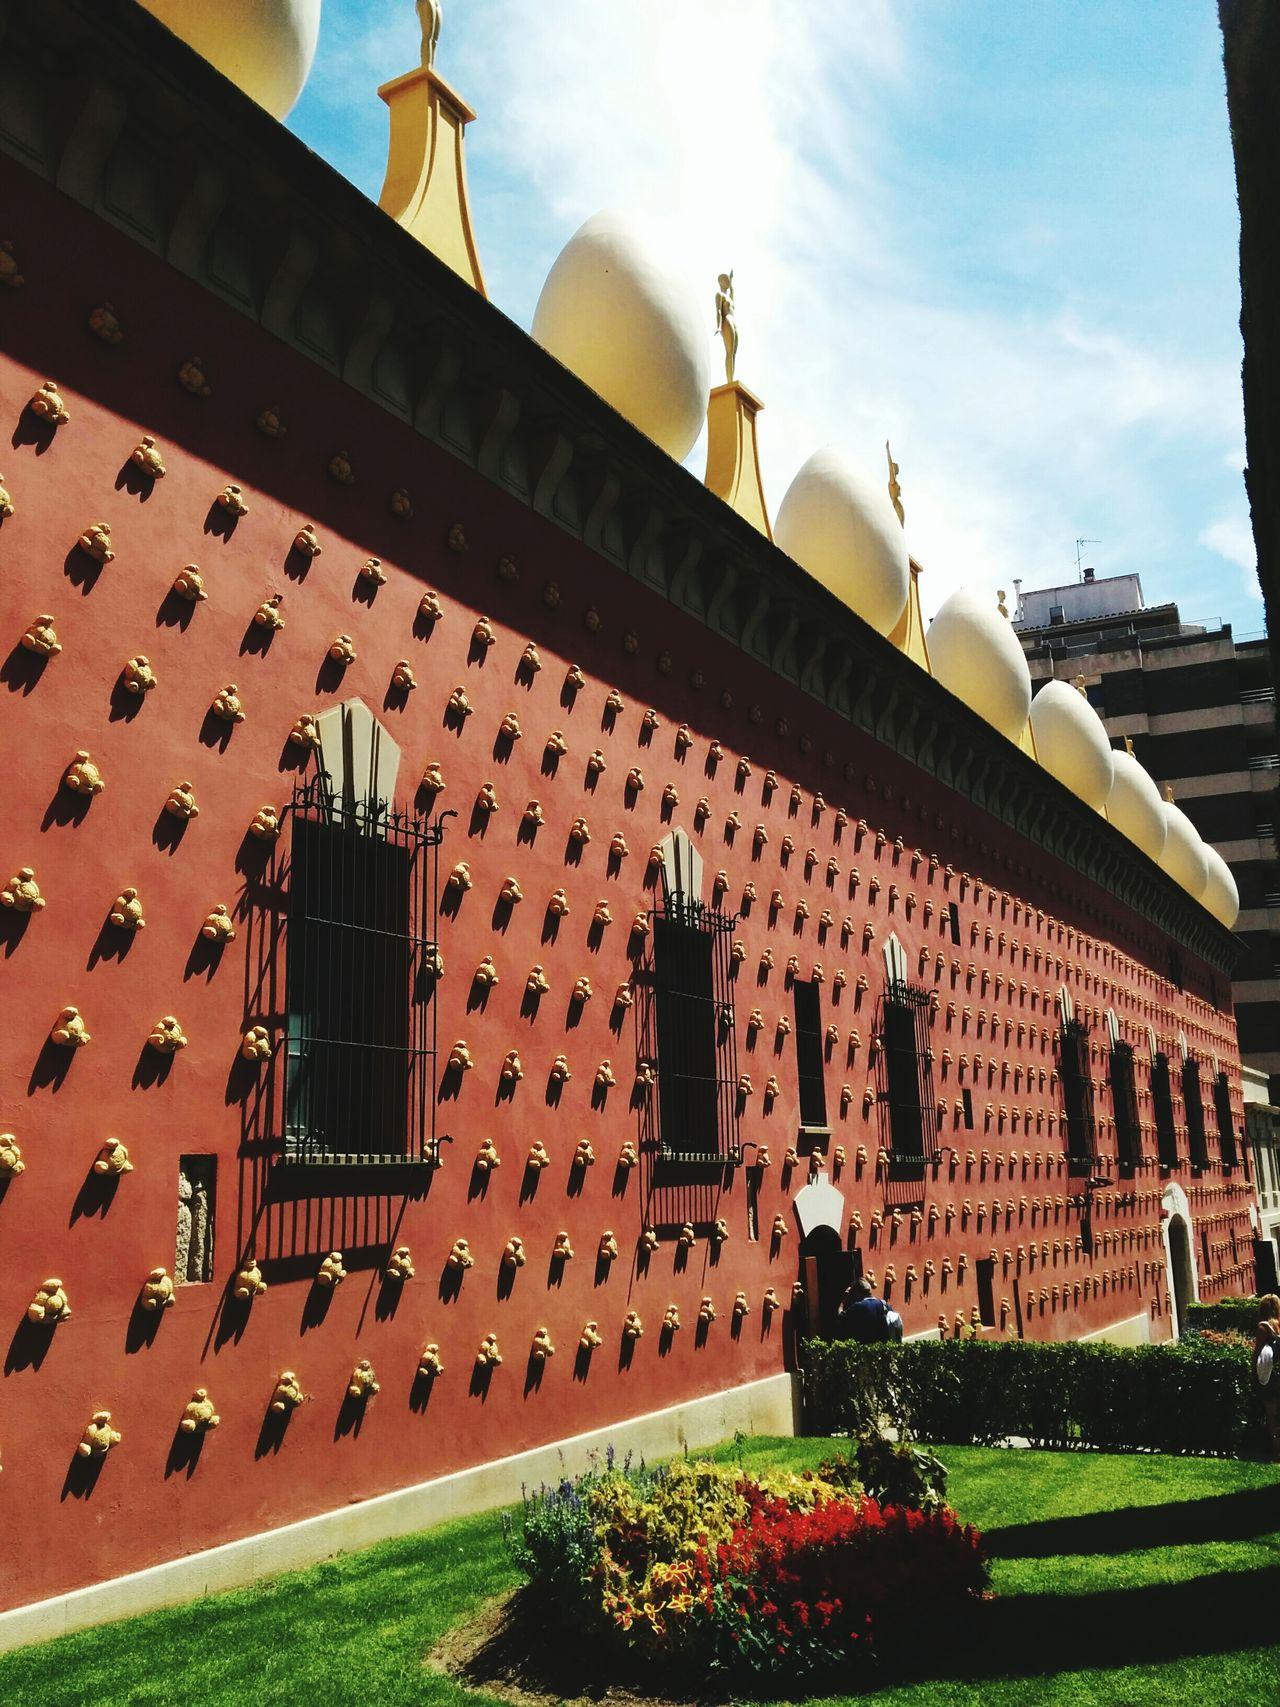 Amazing Architecture Salvadordali